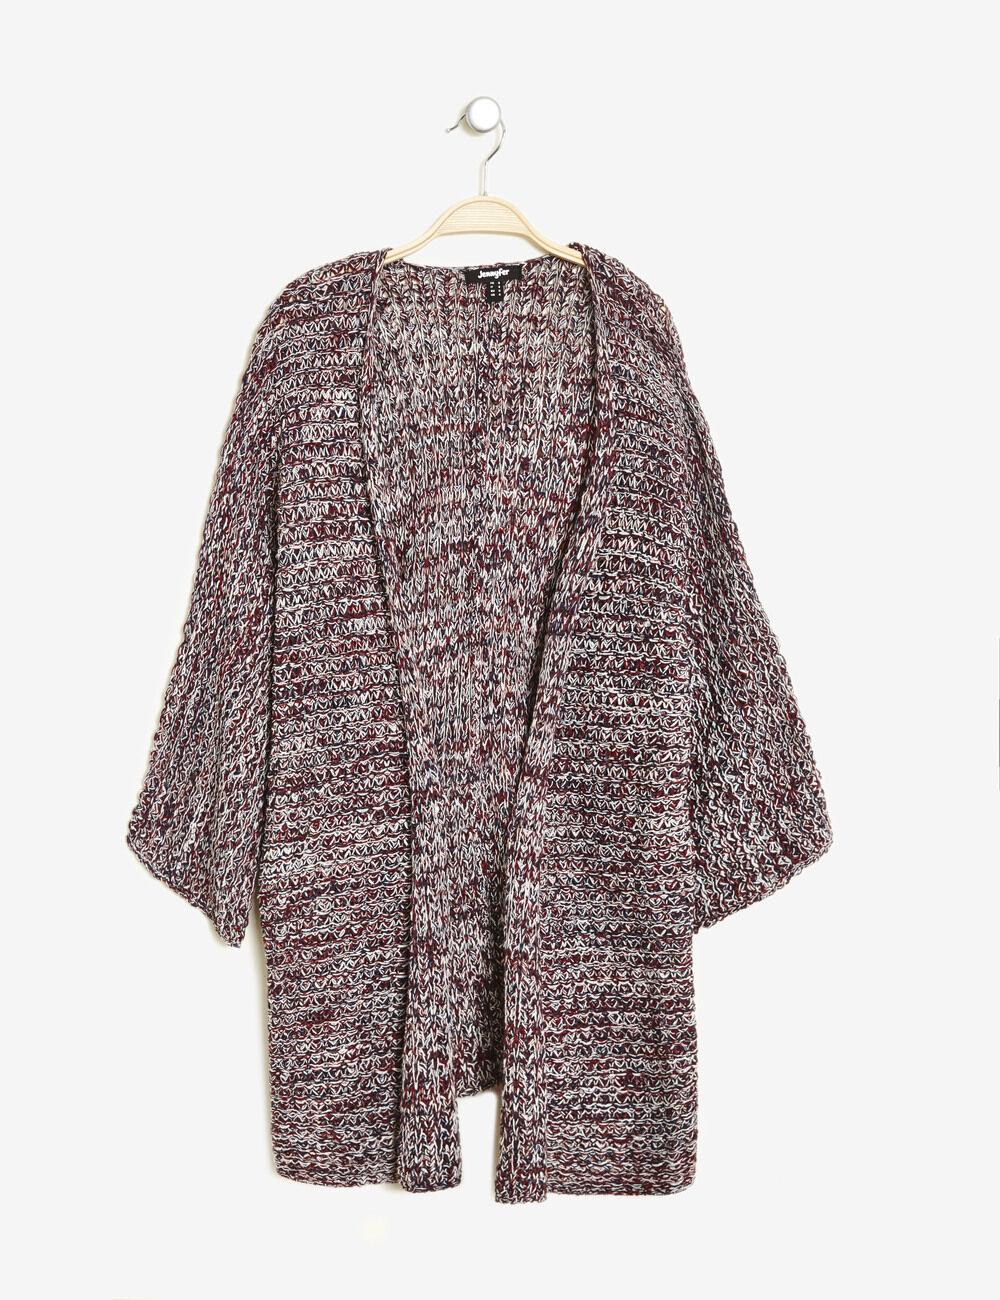 gilet kimono maille ajour e bordeaux cru et bleu marine moulin femme jennyfer. Black Bedroom Furniture Sets. Home Design Ideas